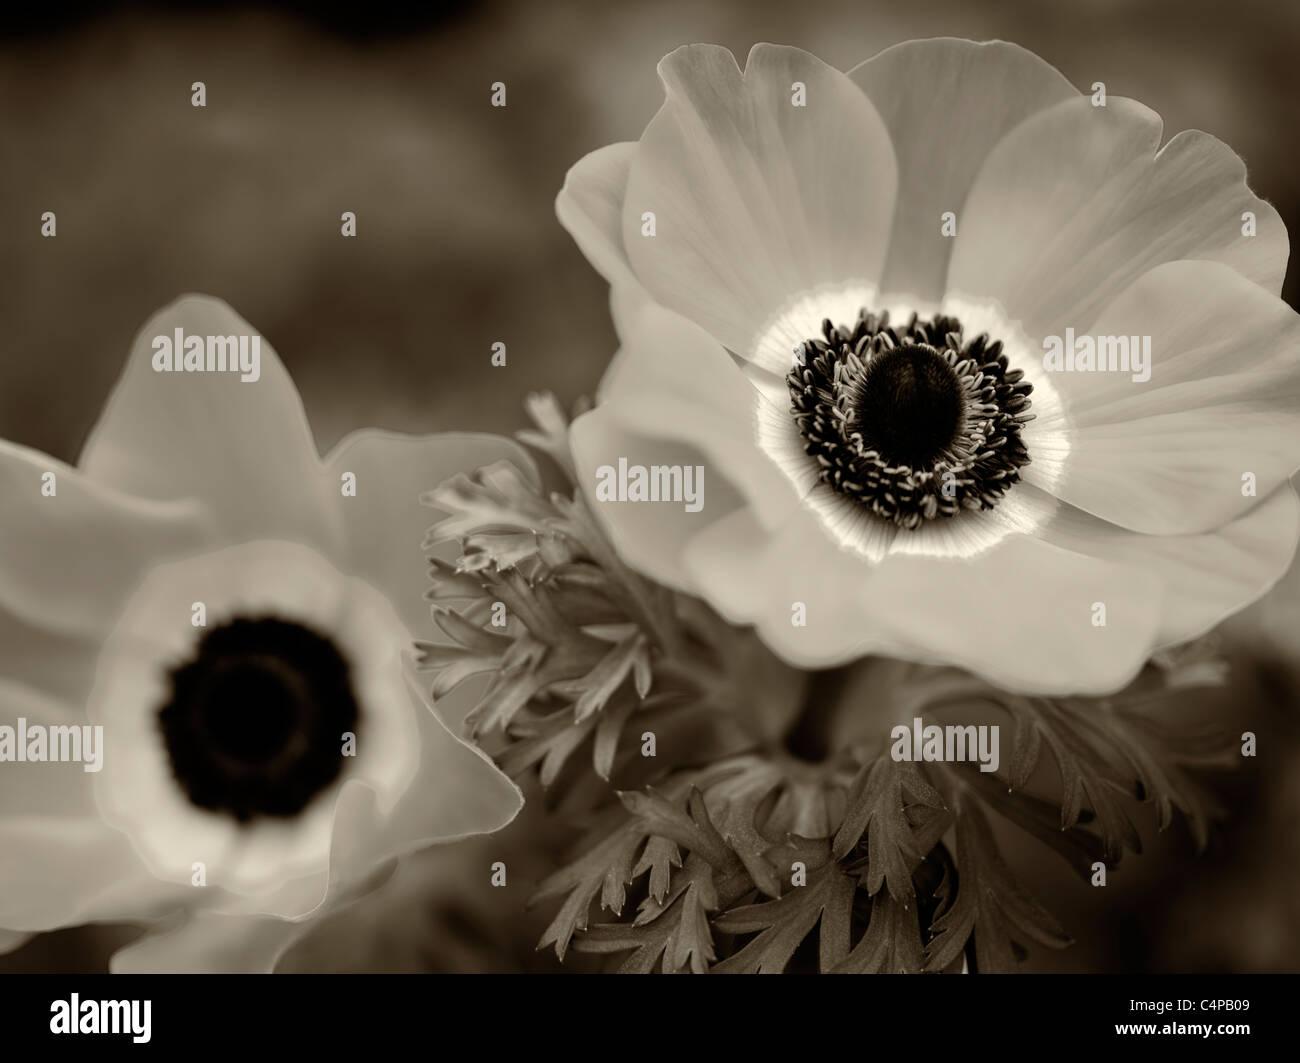 Close up of Harmony Scarlet Anemone Photo Stock